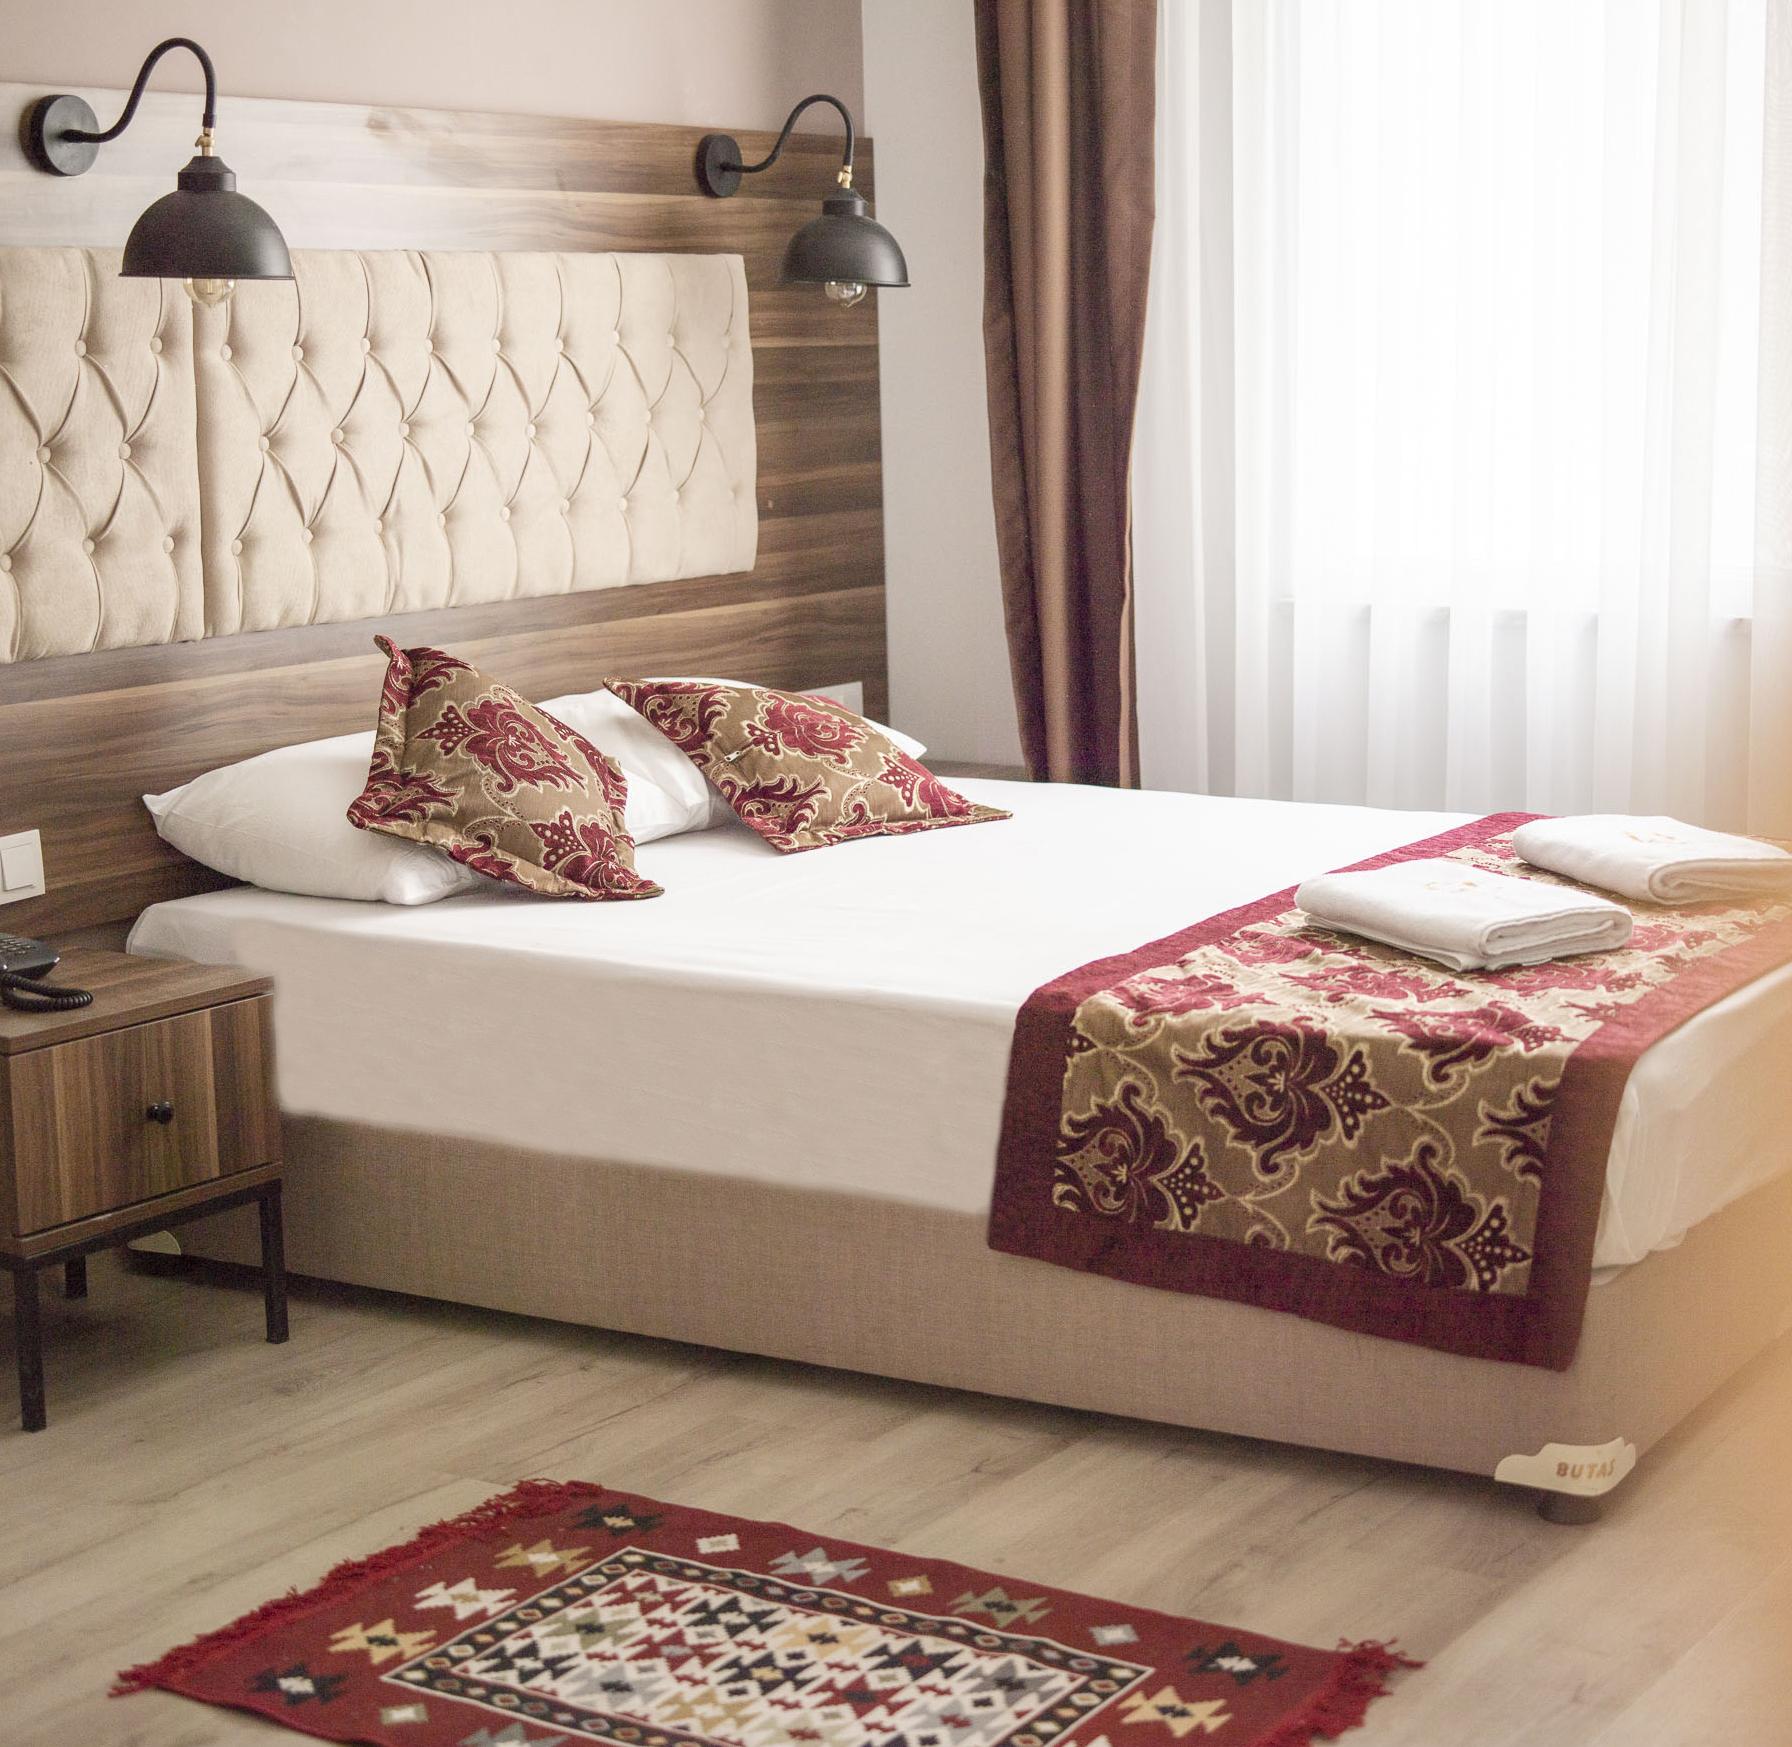 reina hotel ayasofya, sultanahmet